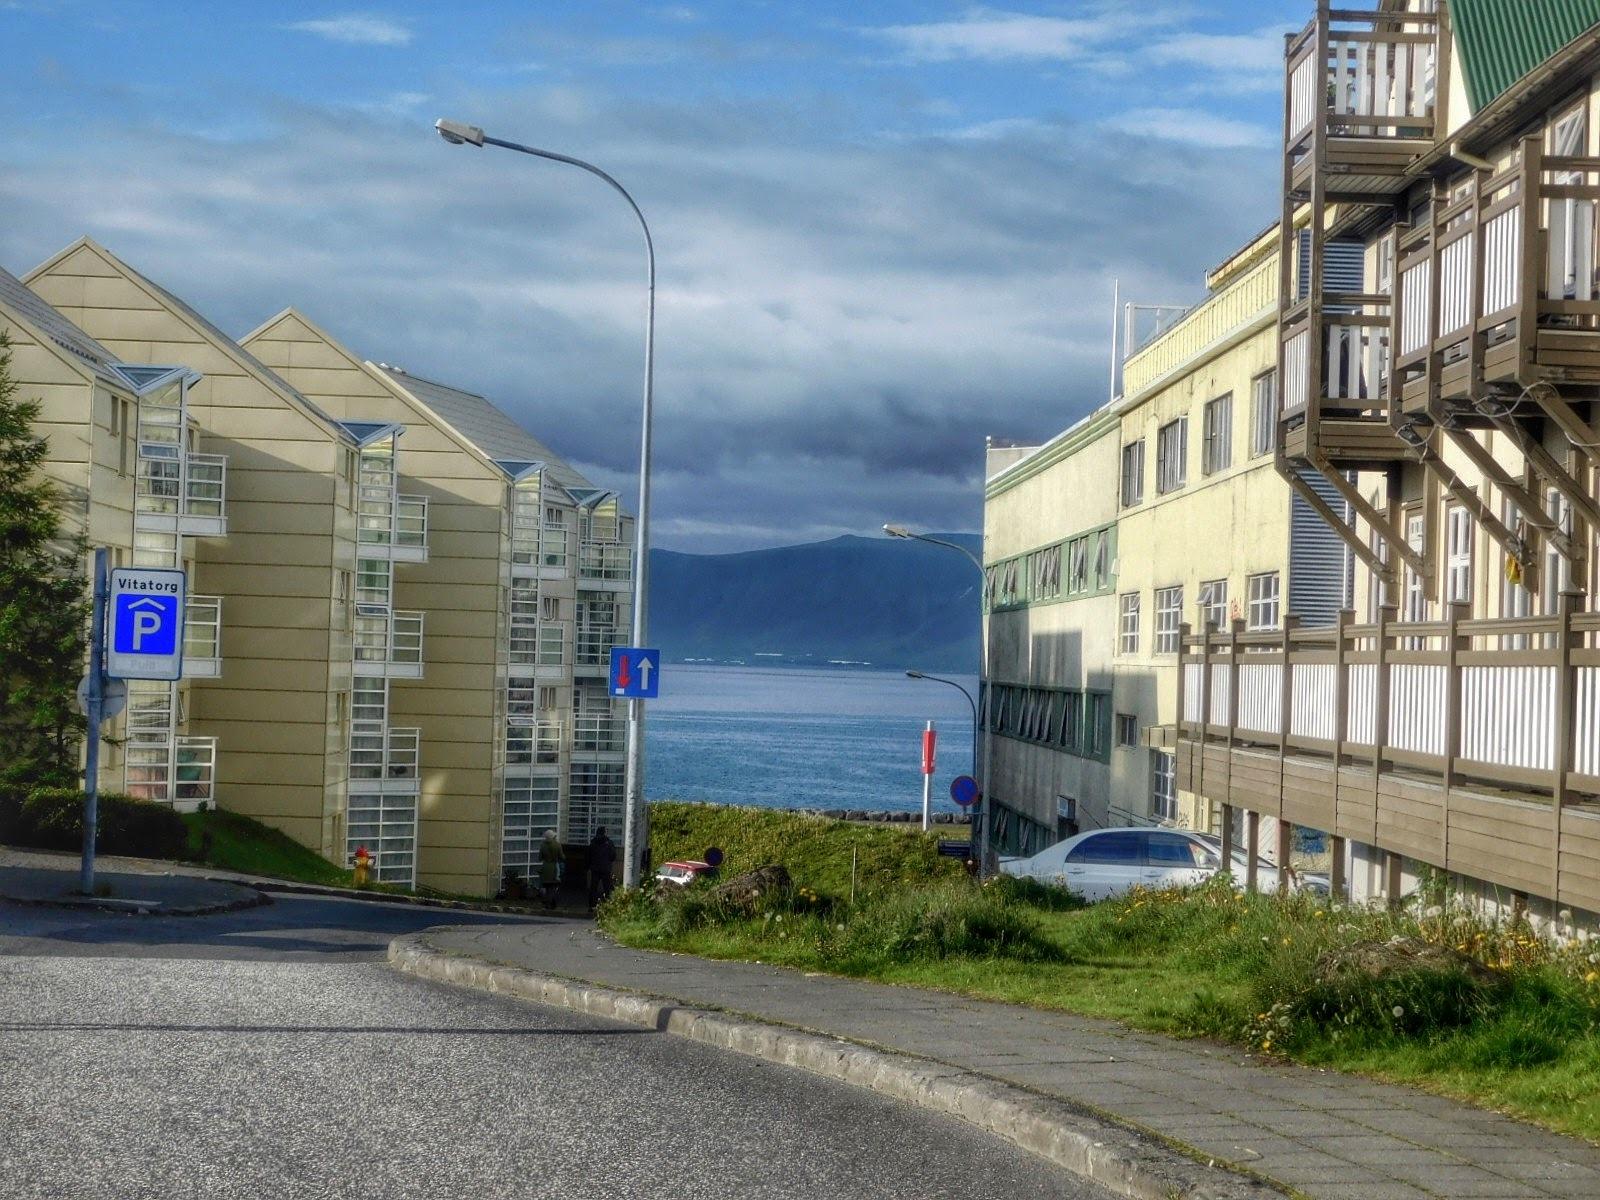 Reykjavik Iceland  by Sheila Button